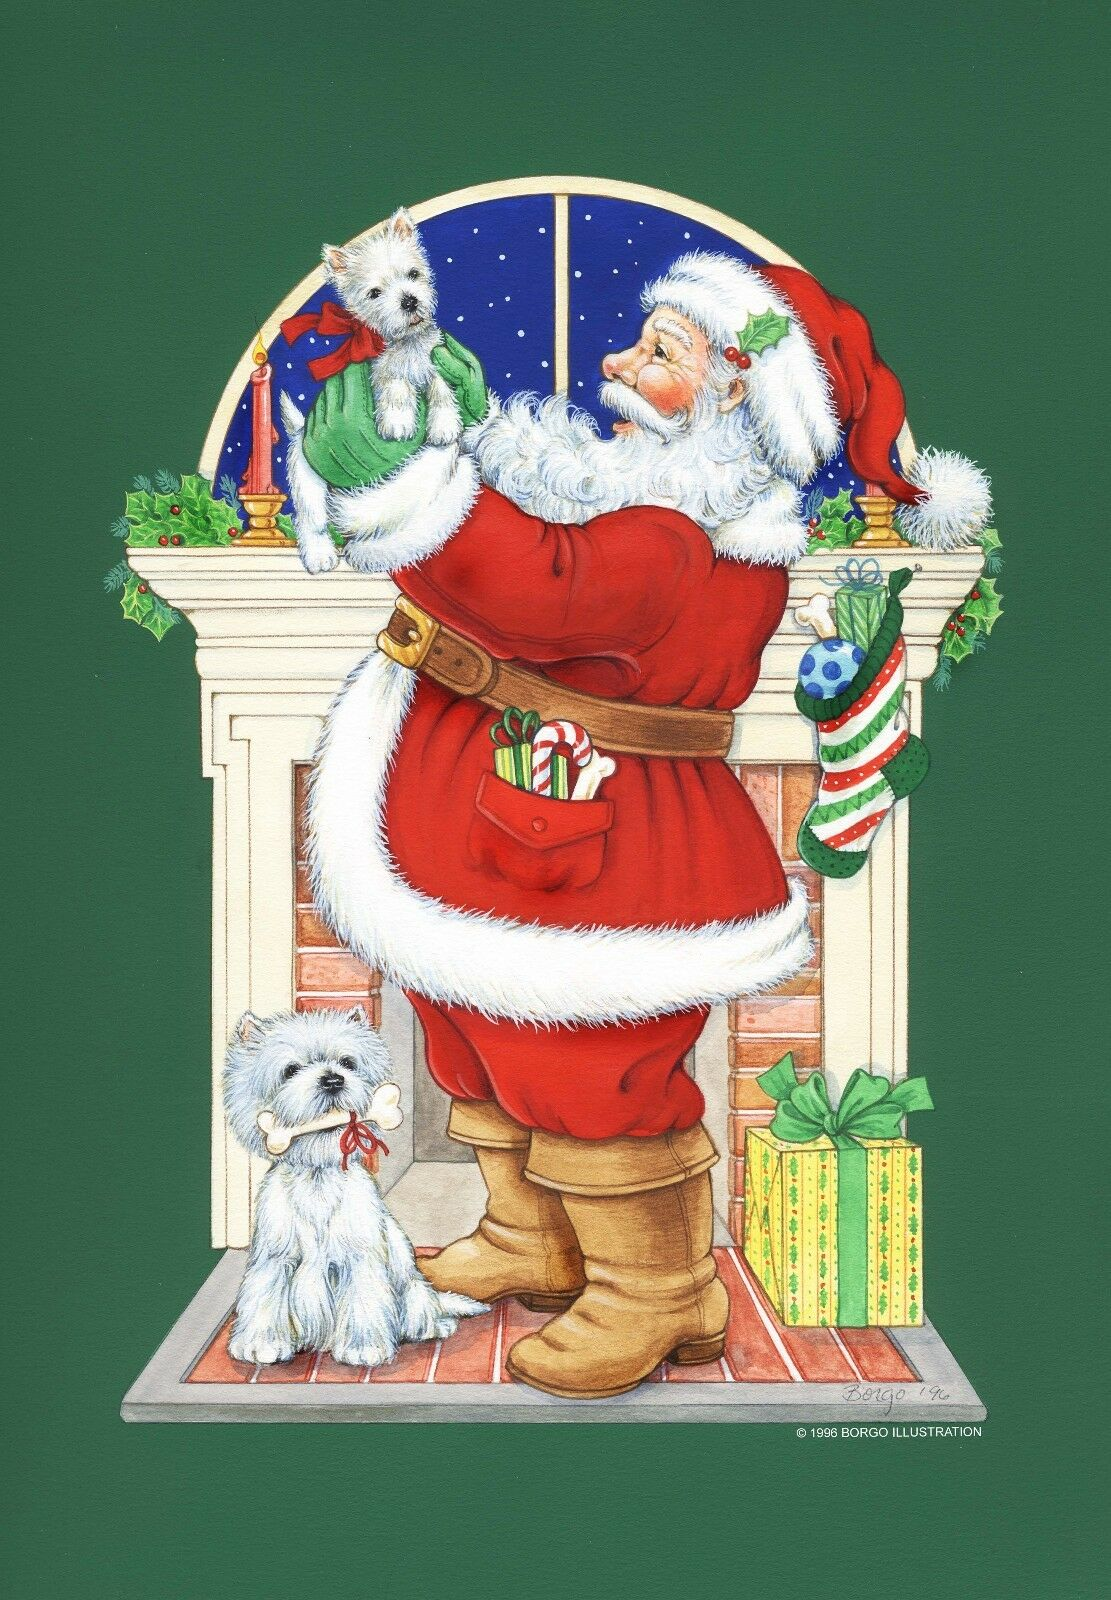 Westie Christmas Cards Santa S Surprise by Borgo | eBay